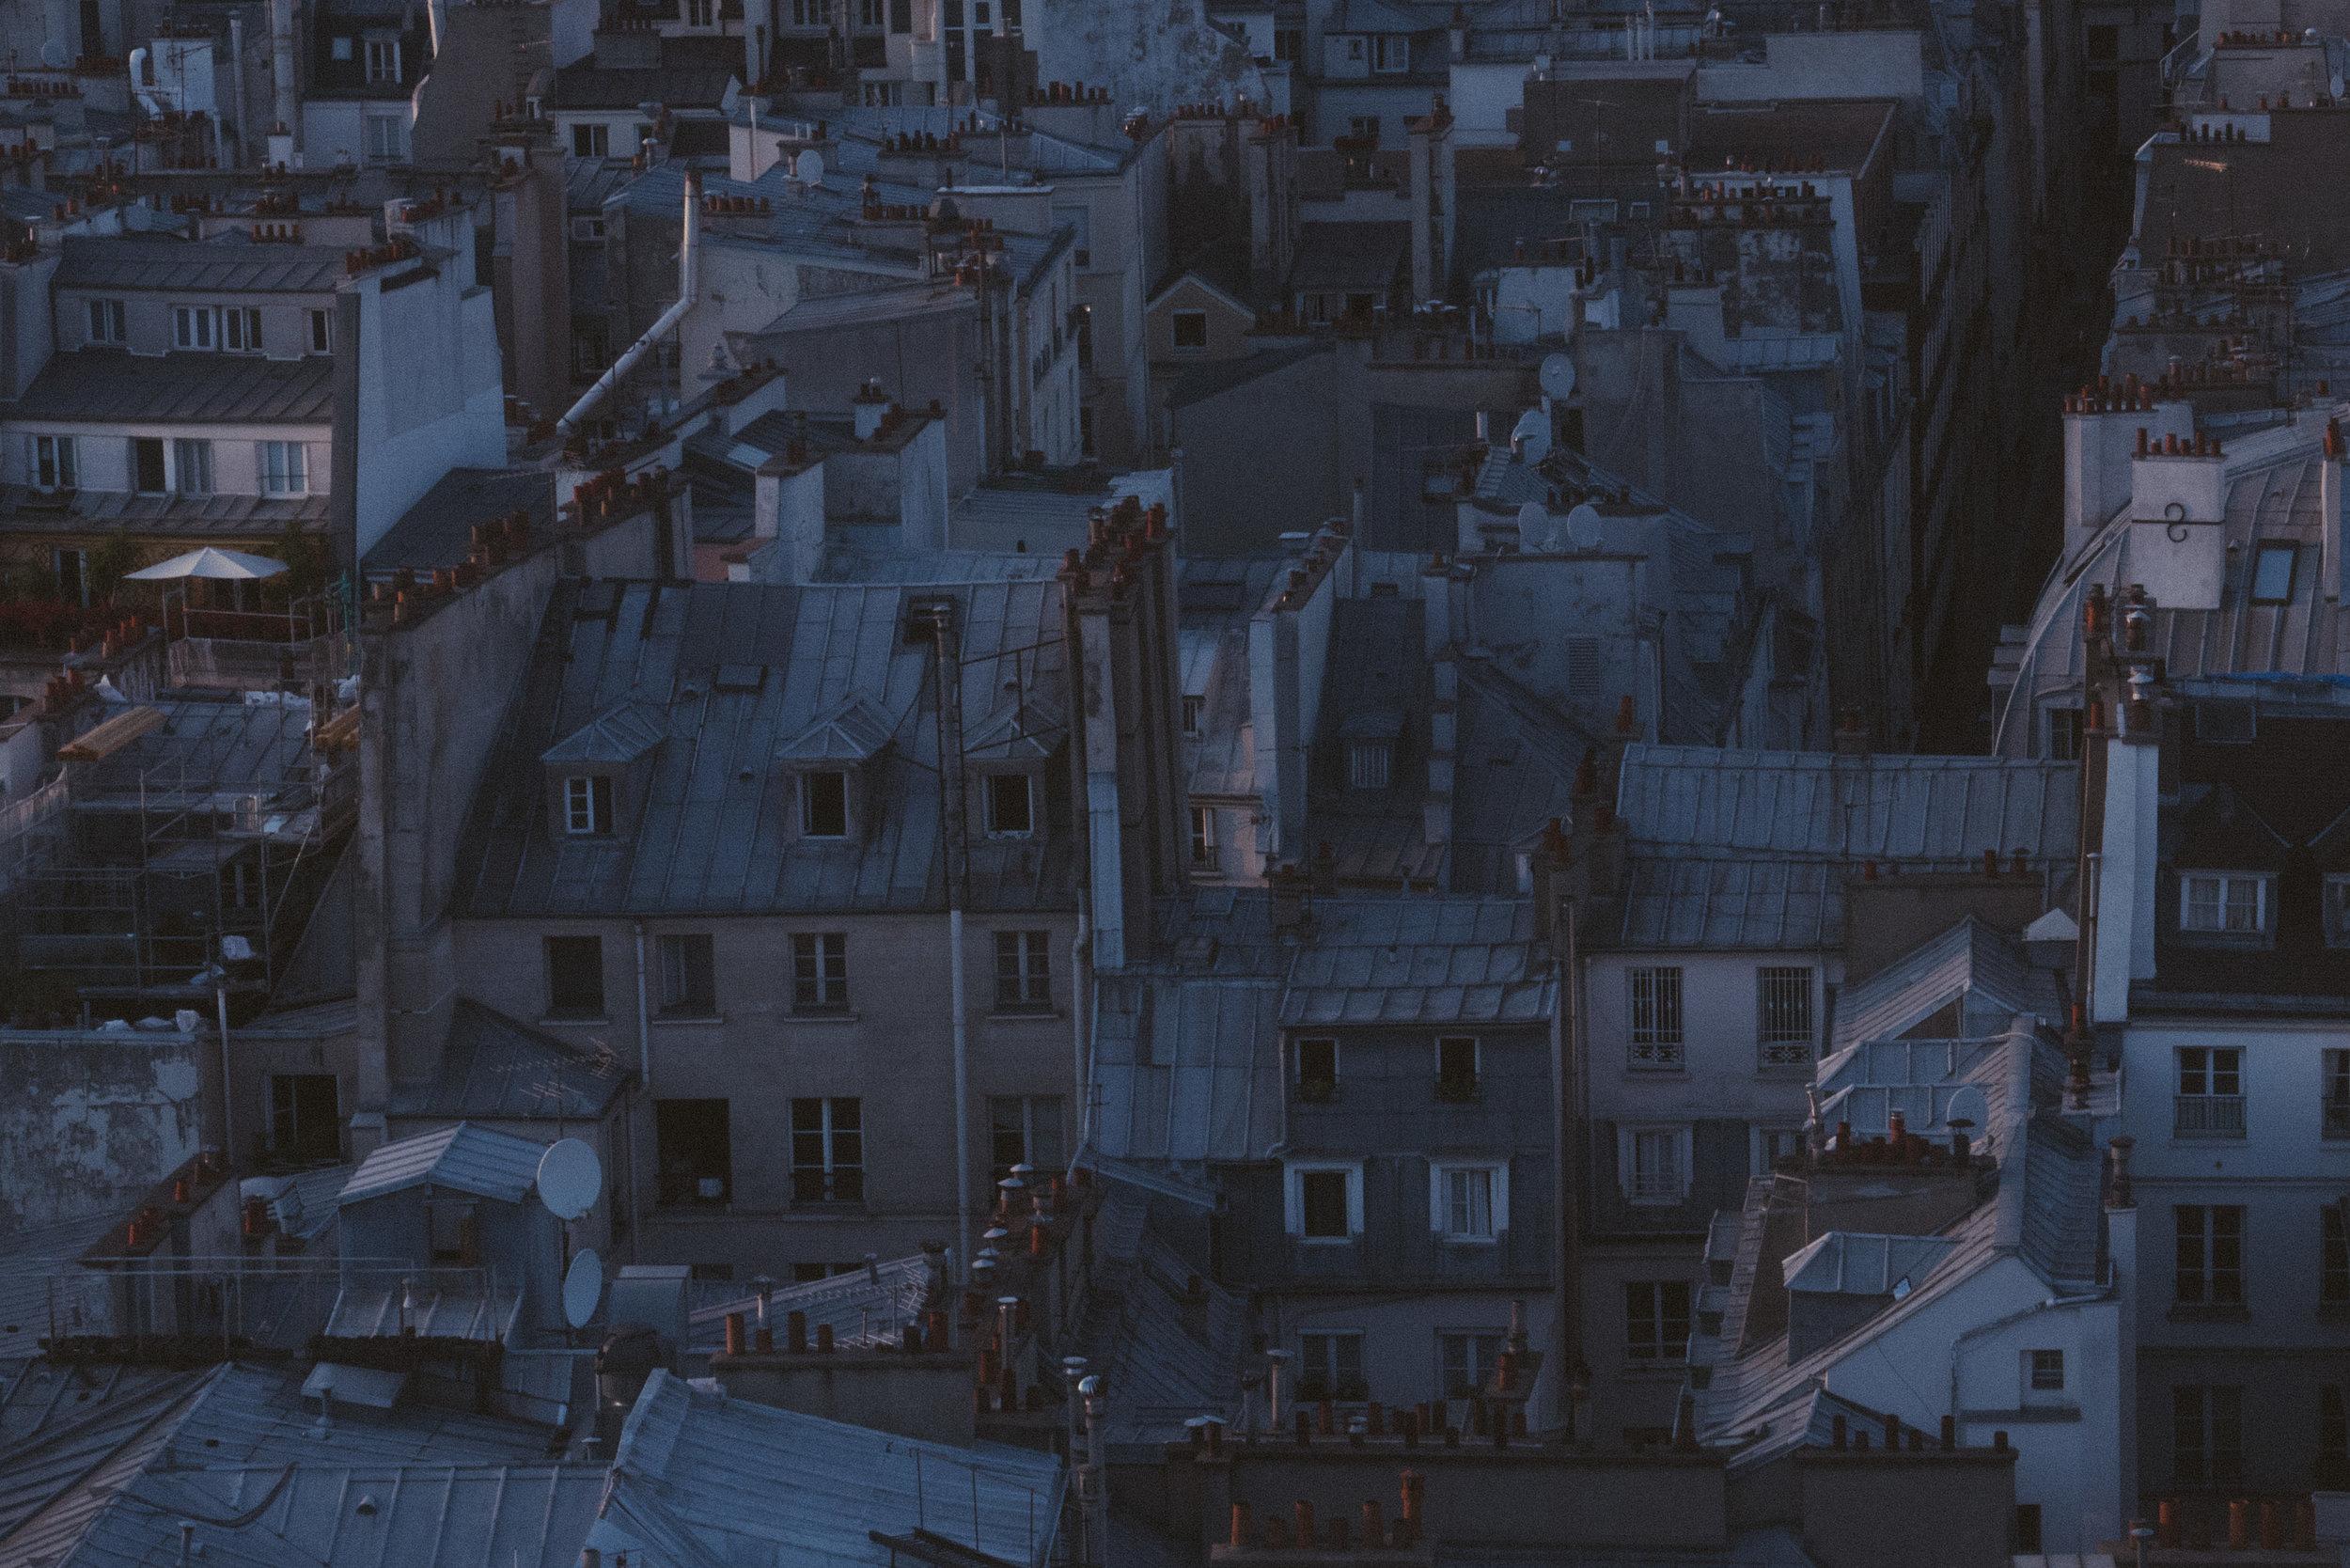 Jean Claude Billmaier - Lifestyle -5121.jpg